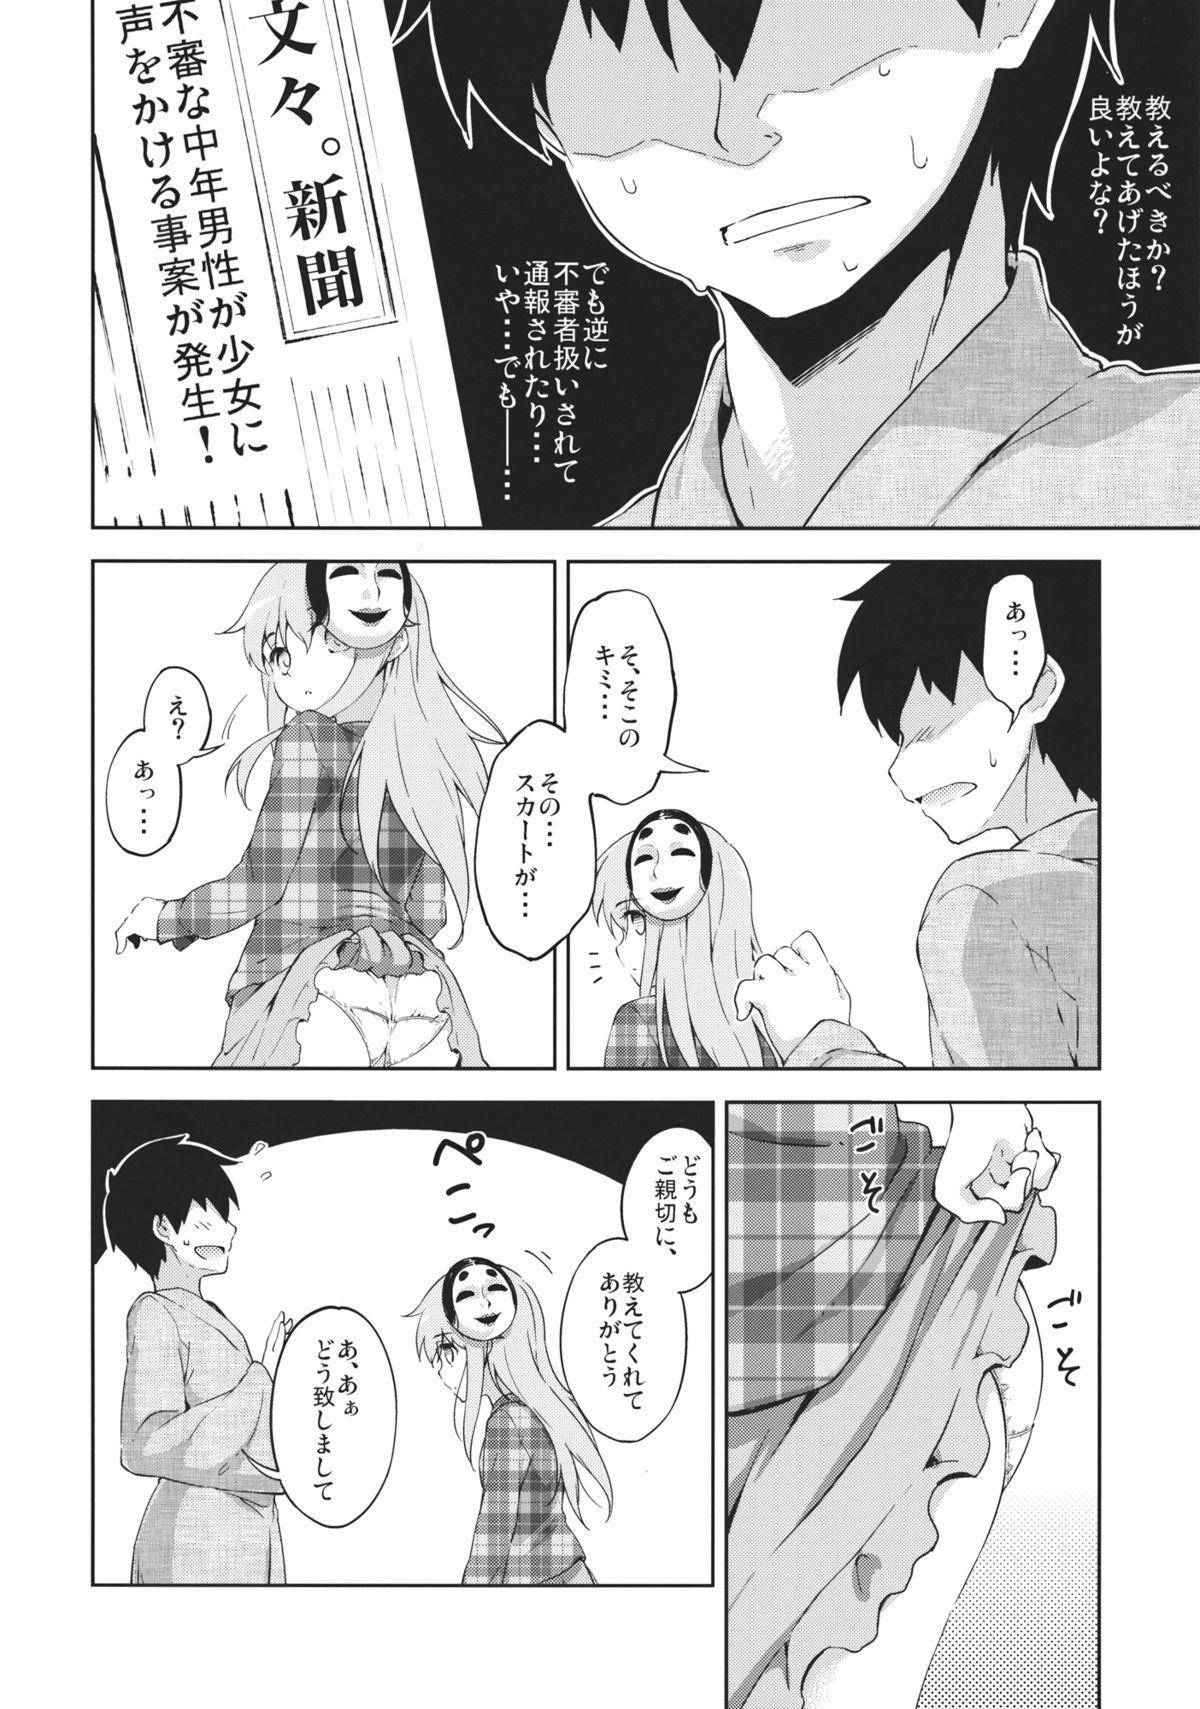 Kokoro, Sarakedashite 4